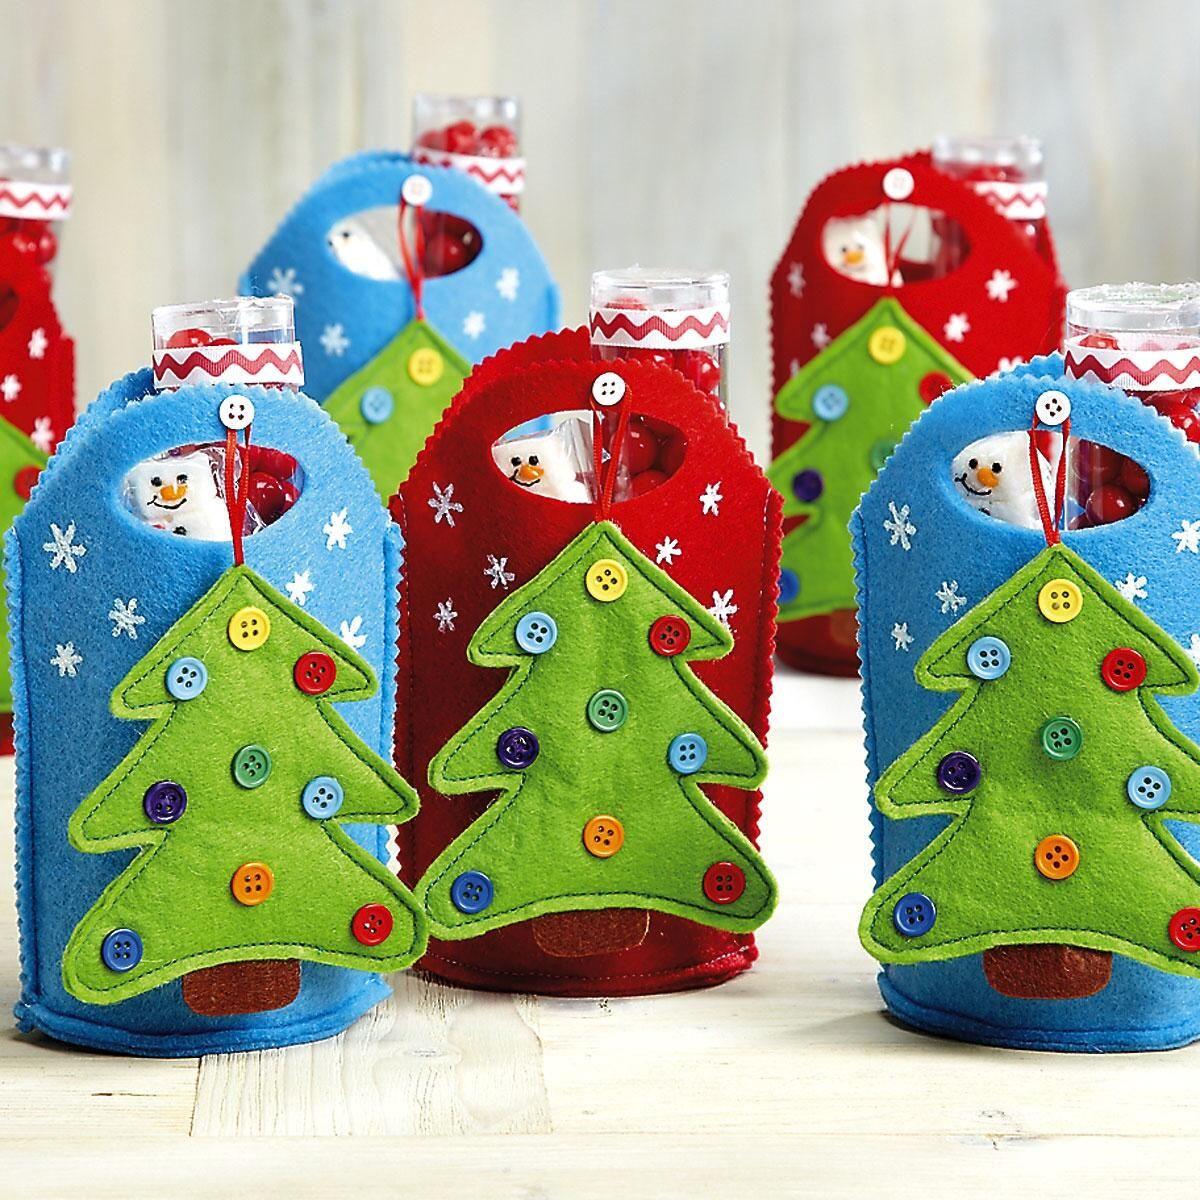 Tree Ornament Treat Bags